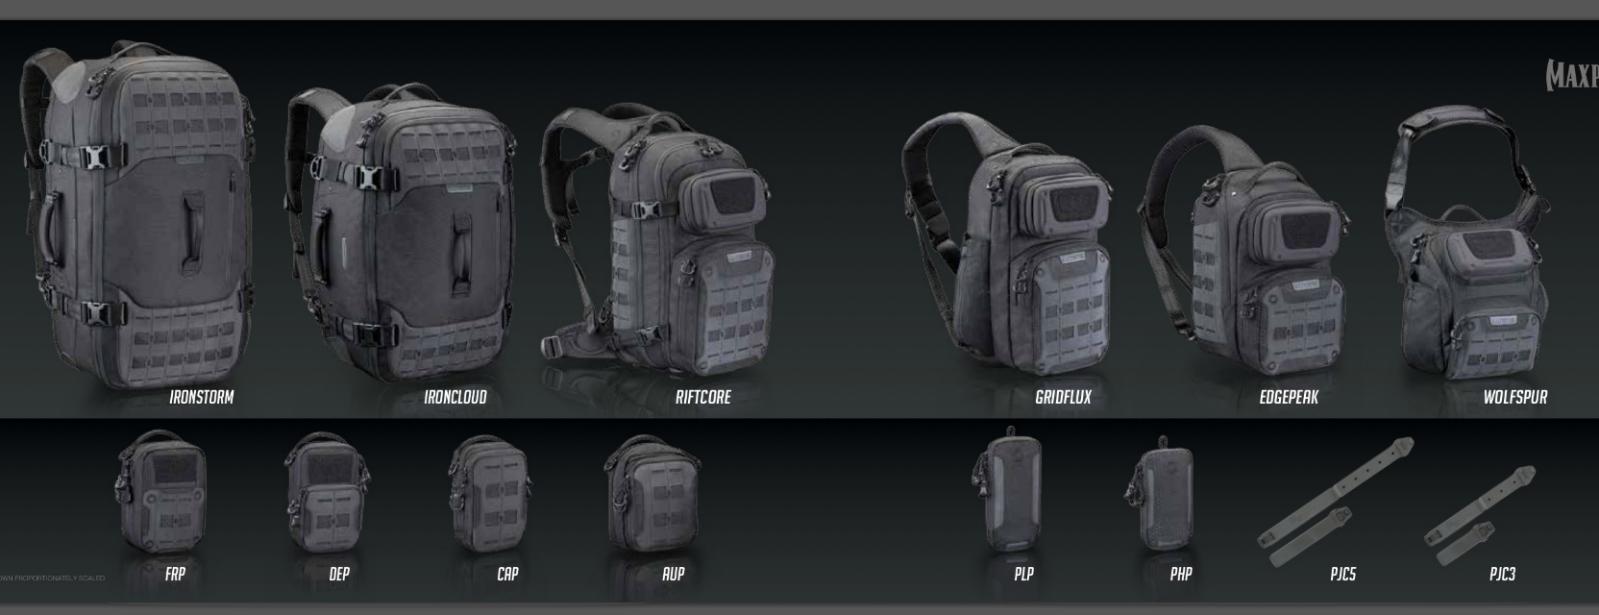 da32f3c8cb Η Maxpedition παρουσιάζει τη νέα σειρά AGR (Advanced Gear Research) στο  Shotshow 2016.